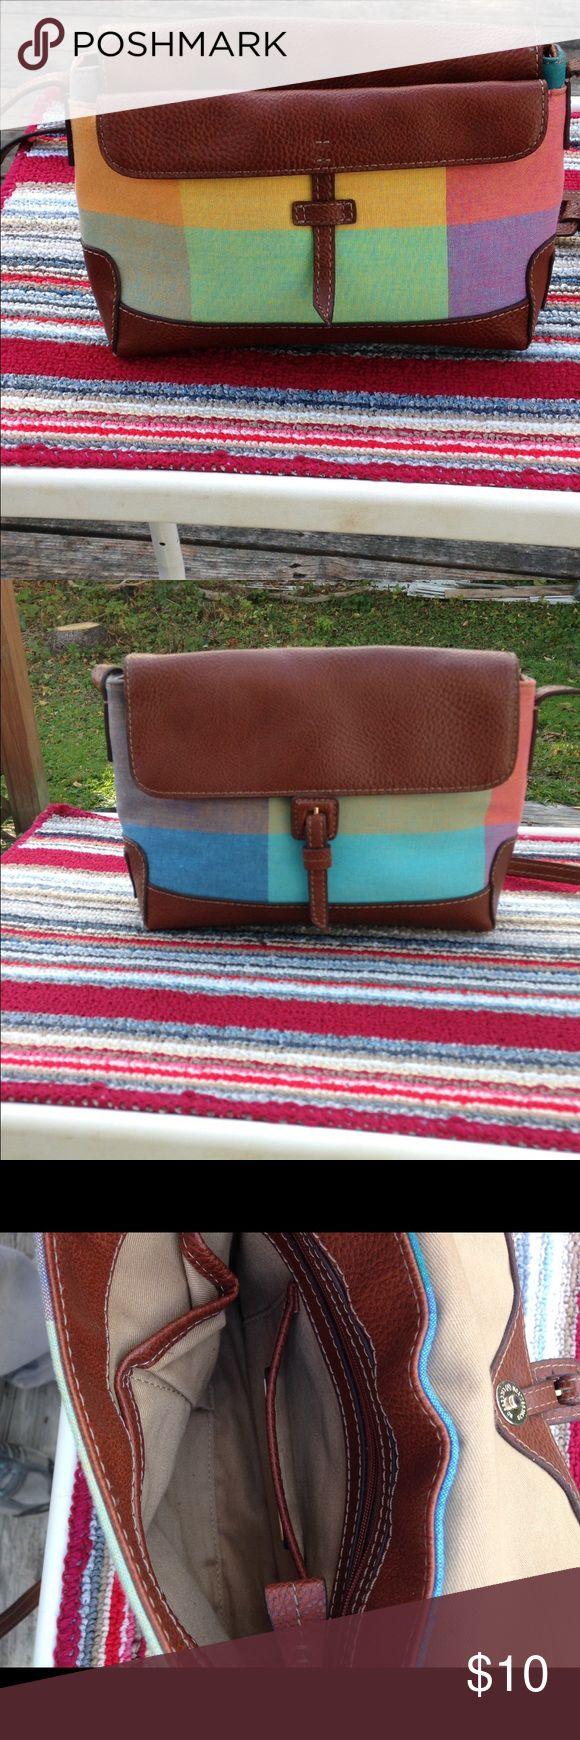 Liz Claiborne Bags - Liz Claiborne purse